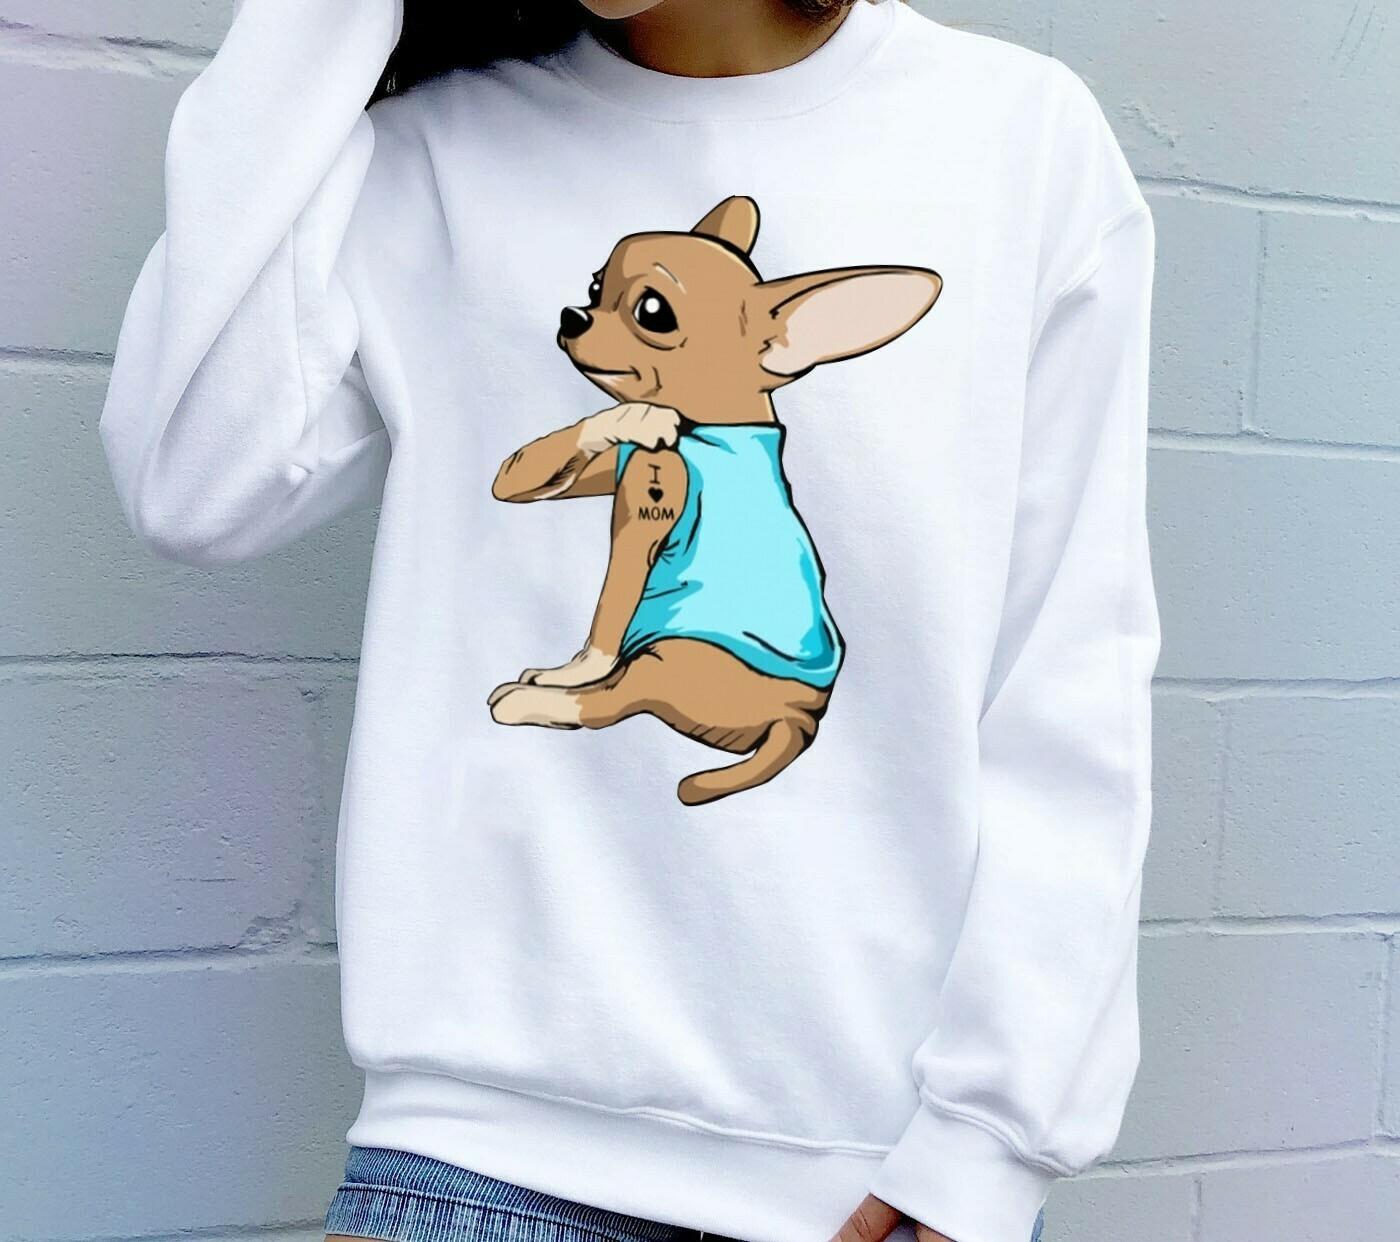 Chihuahua Dog Dog Tattoos I Love Mom Funny Shirt T-Shirt Hoodie Sweatshirt Sweater Tee Kids Youth Gifts Jolly Family Gifts